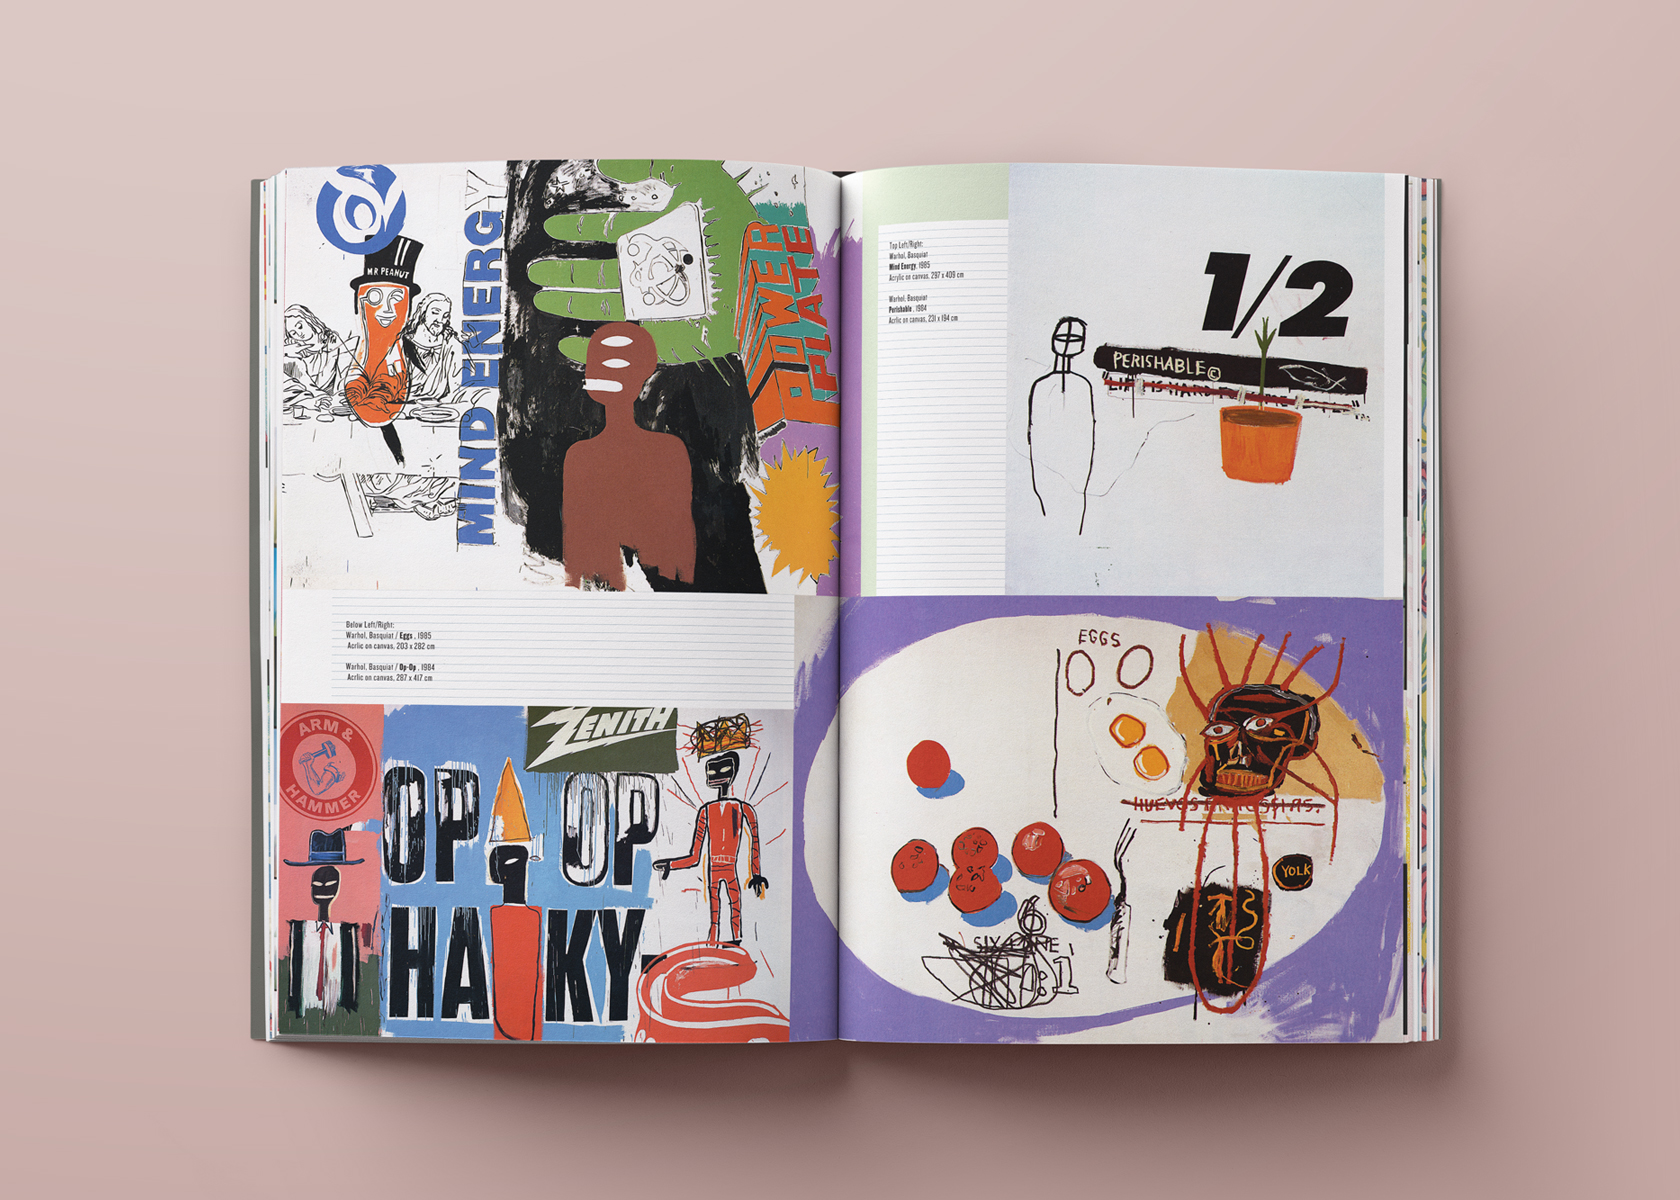 Warhol_Basquiat_Book_Spread_04